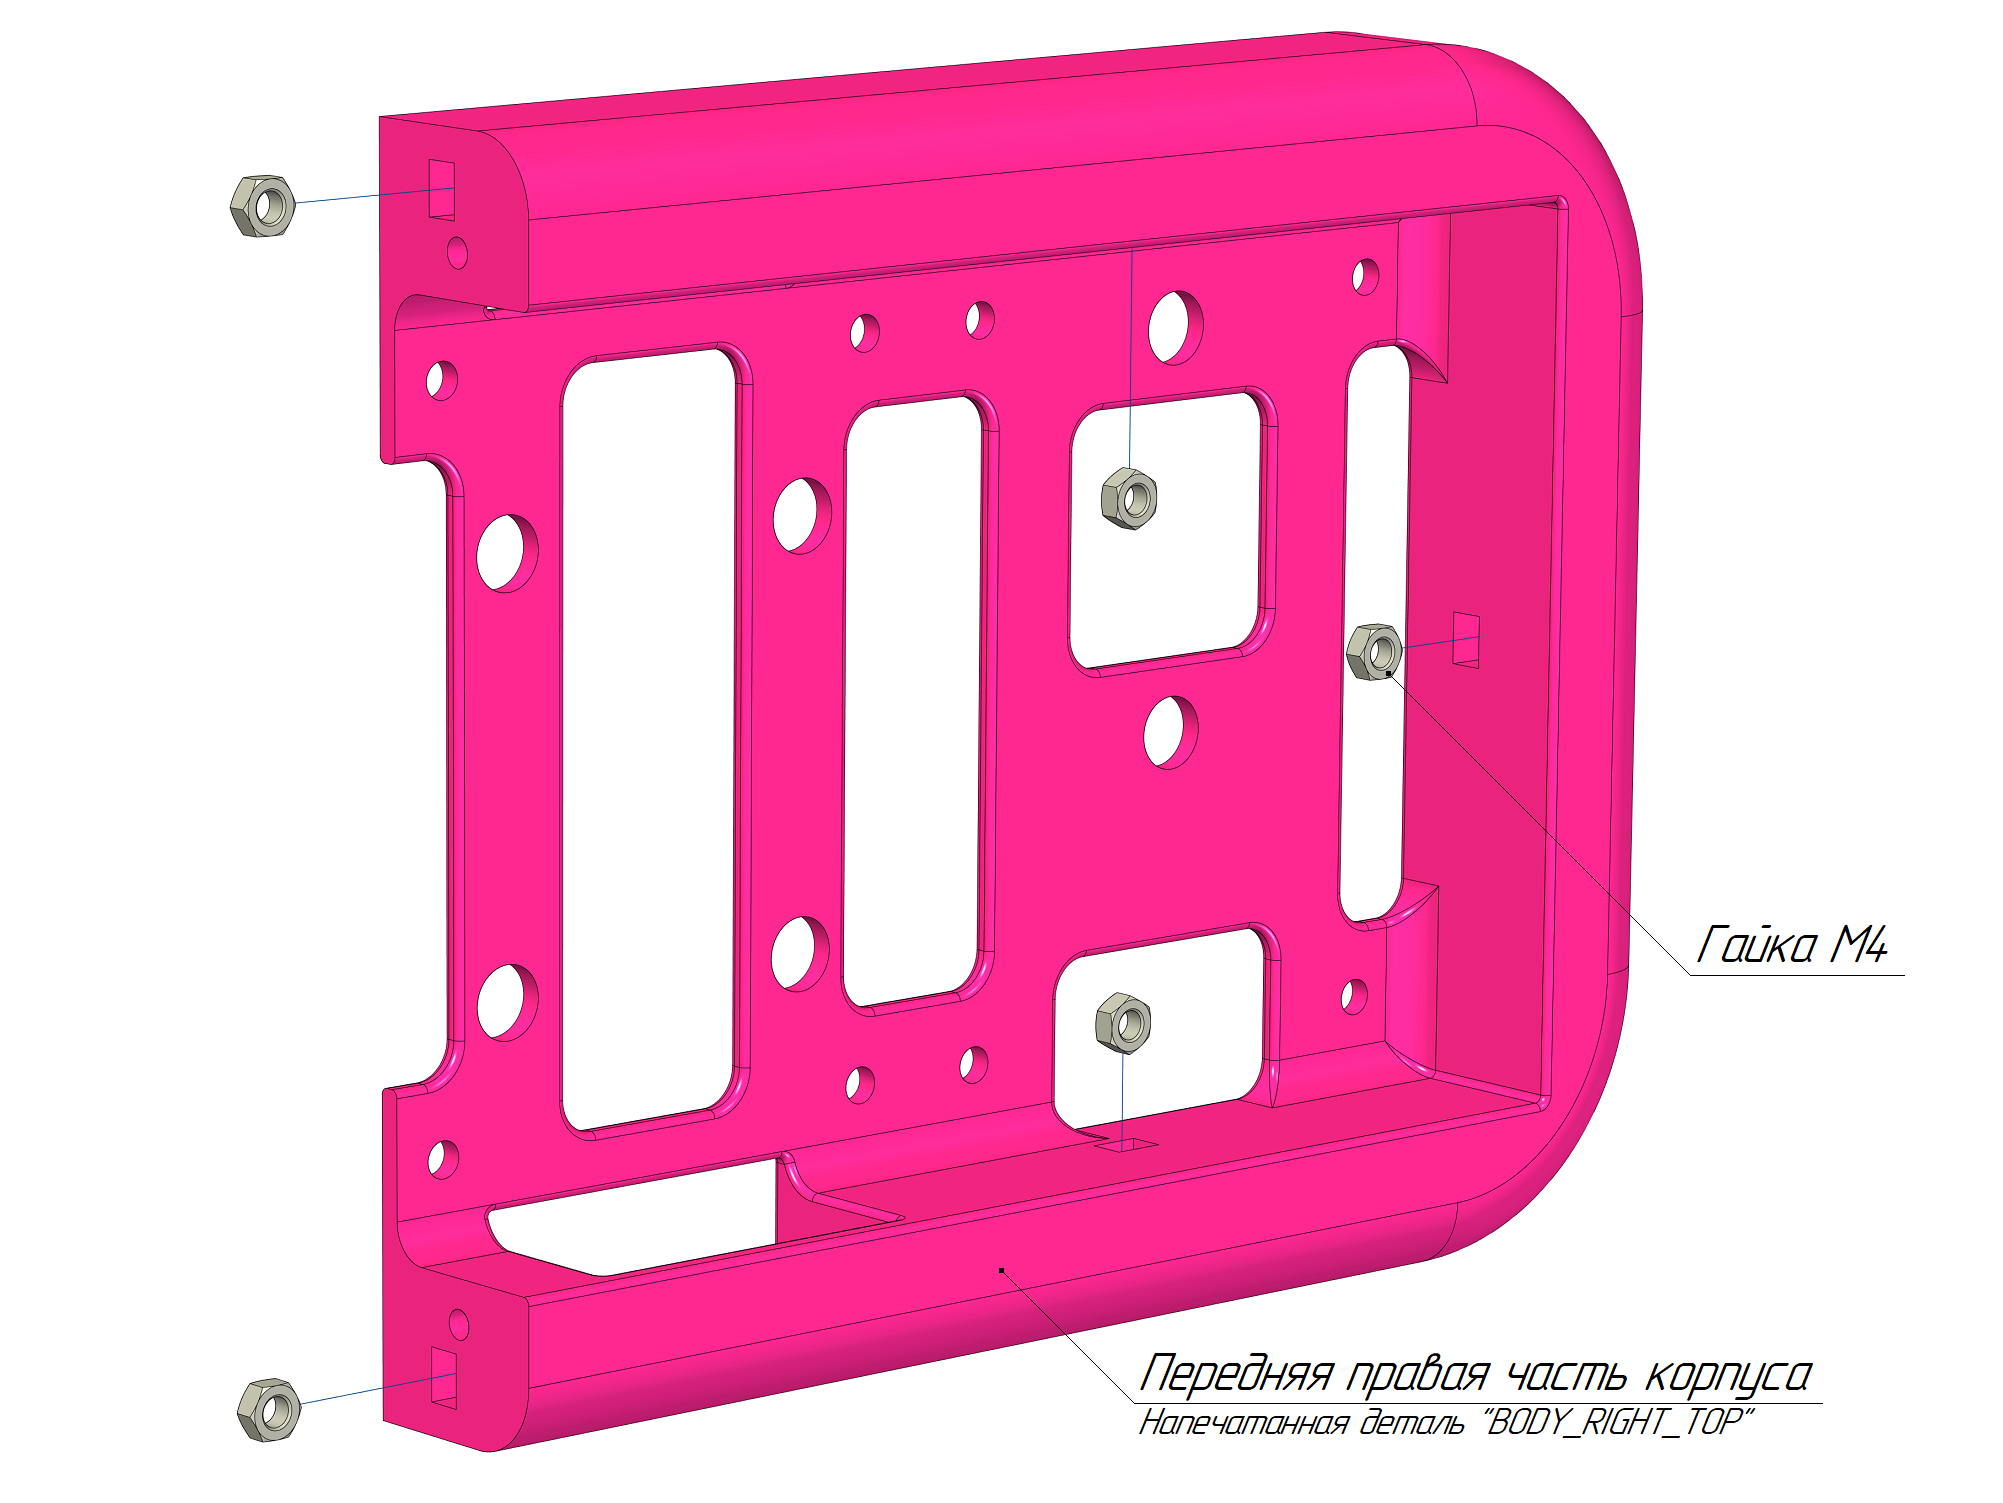 step_6_assemble_6